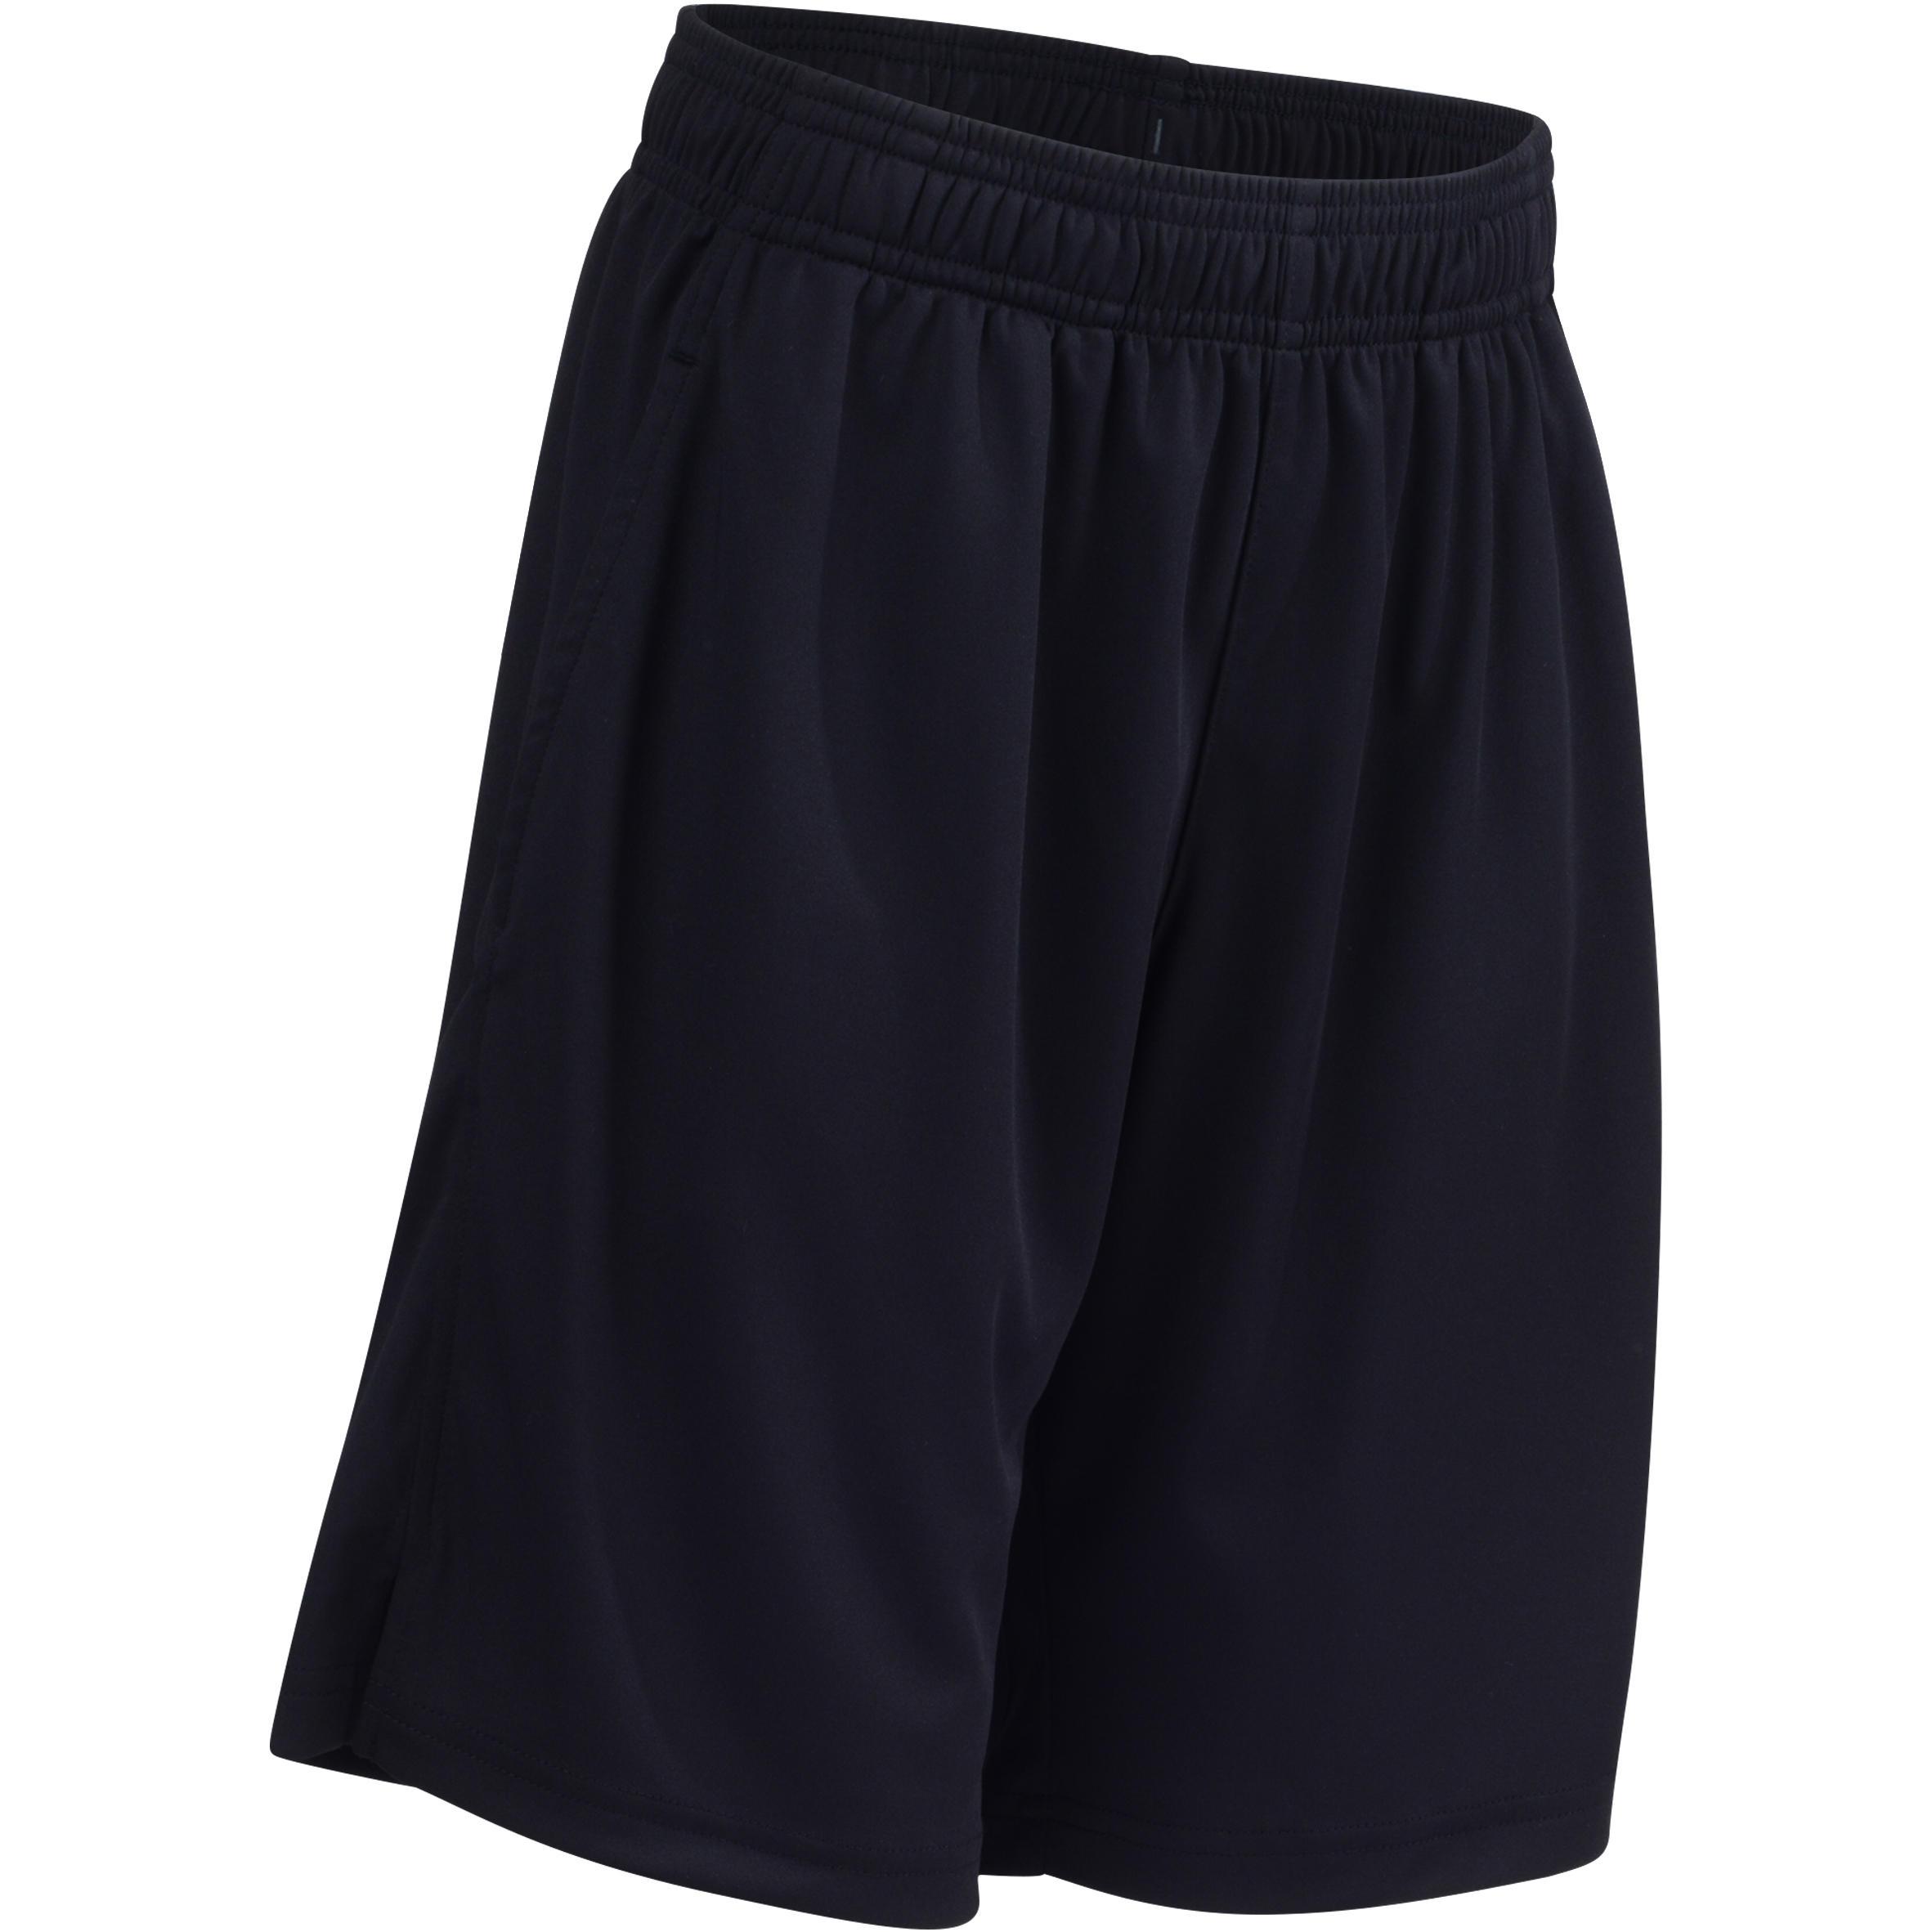 Short 560 Gym garçon poches noir